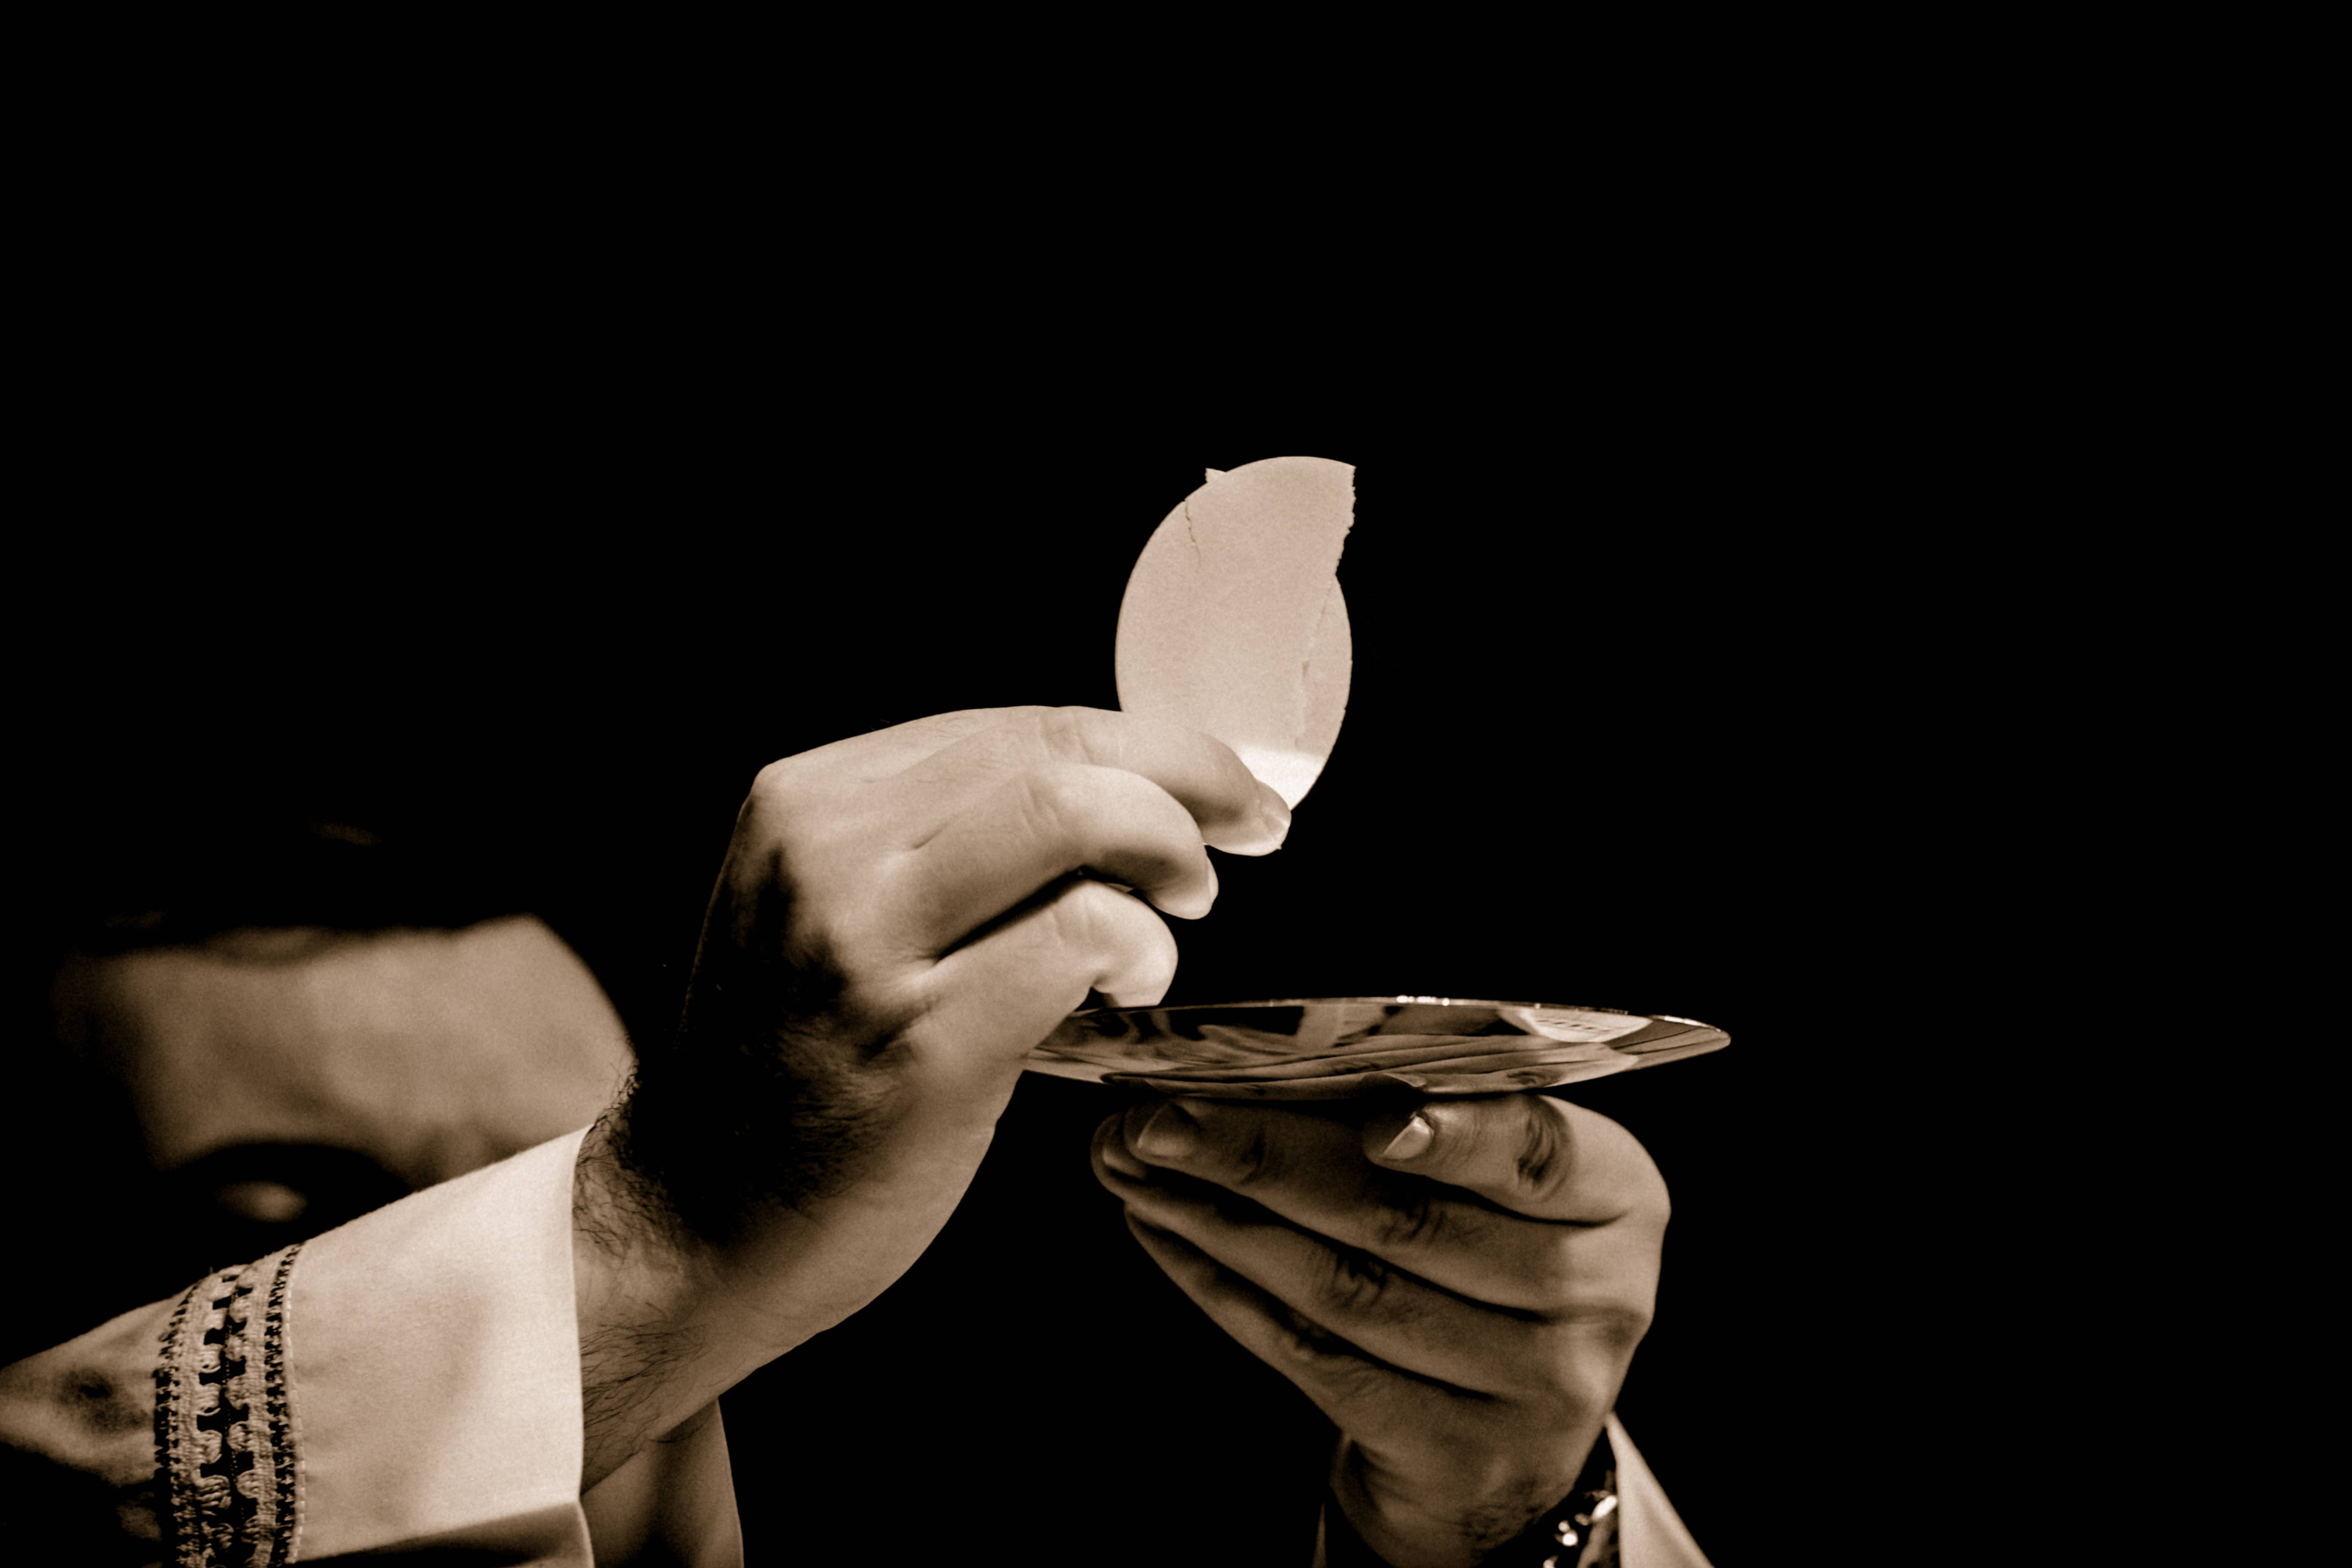 Pan de Vida © Cathopic